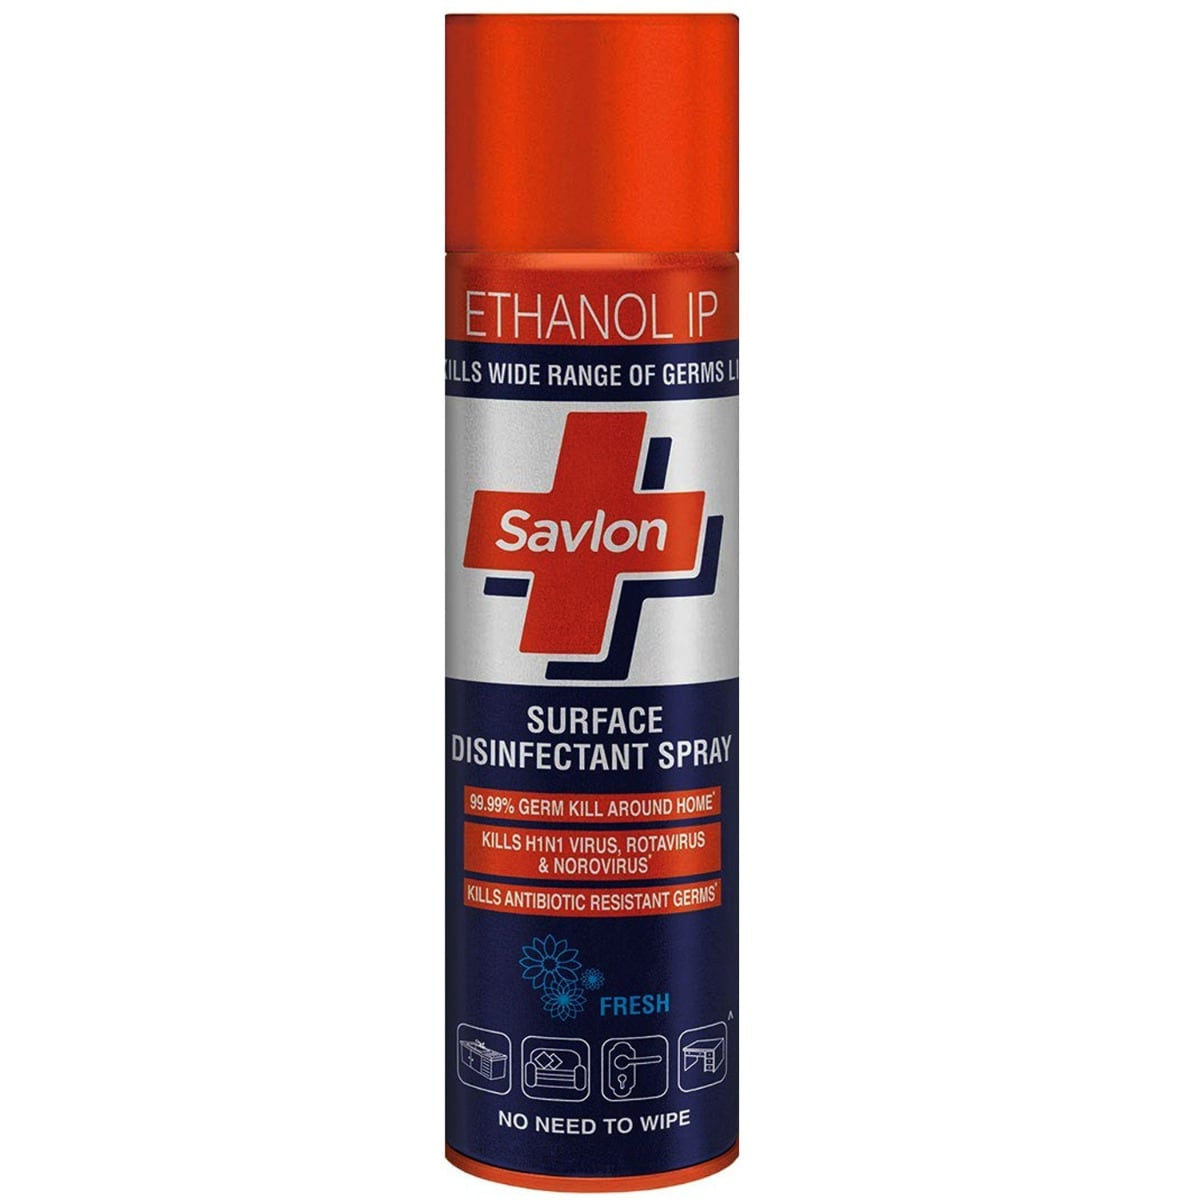 Savlon Surface Disinfectant Spray, 170 gm